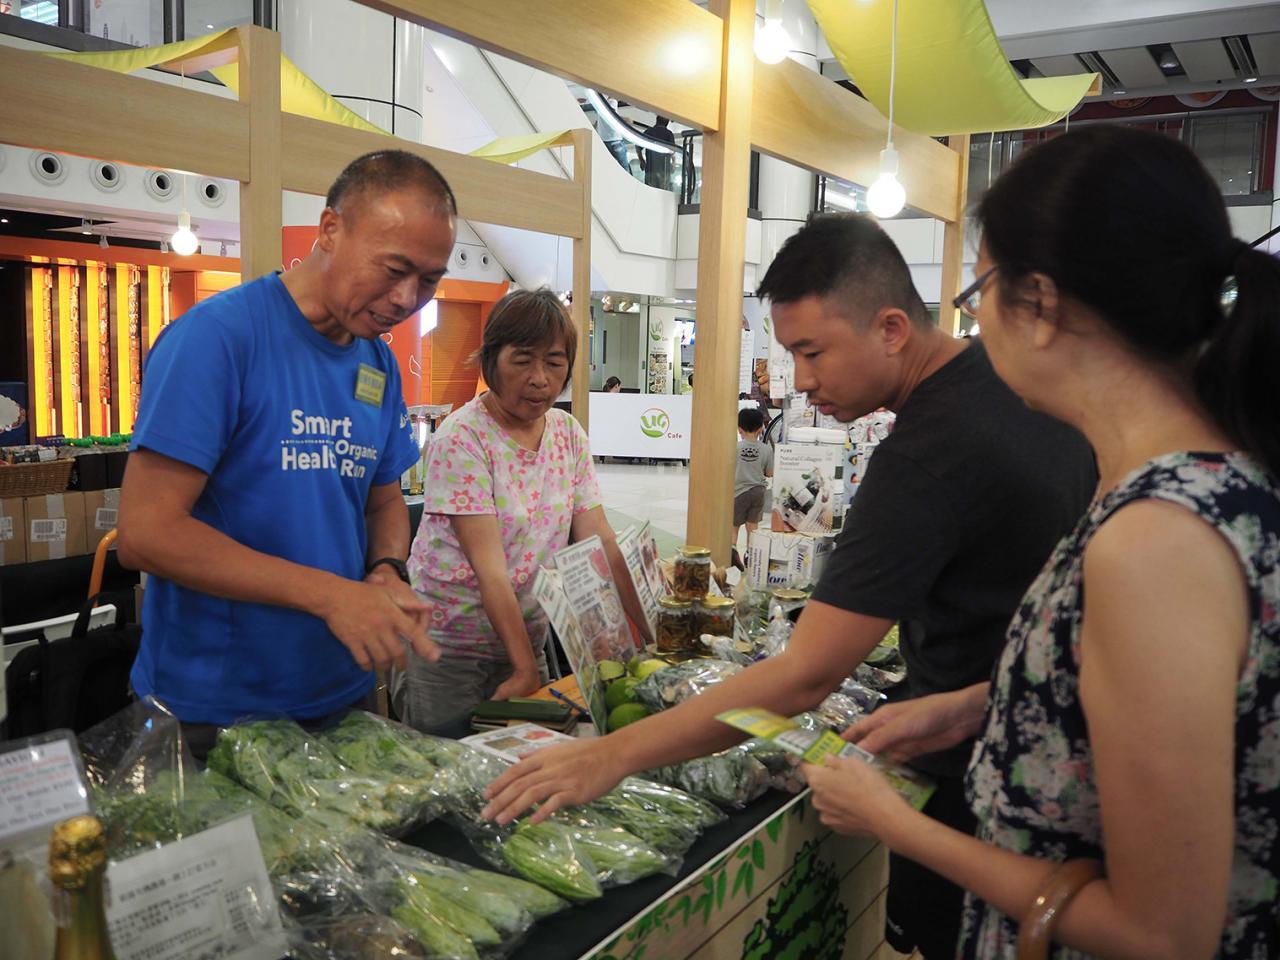 KCP九龍城廣場的「全齡•傳承•擁抱愛」夏日•綠色市集,每周均召集不同綠色潮人攤檔,當中包括有機新鮮農產蔬果。